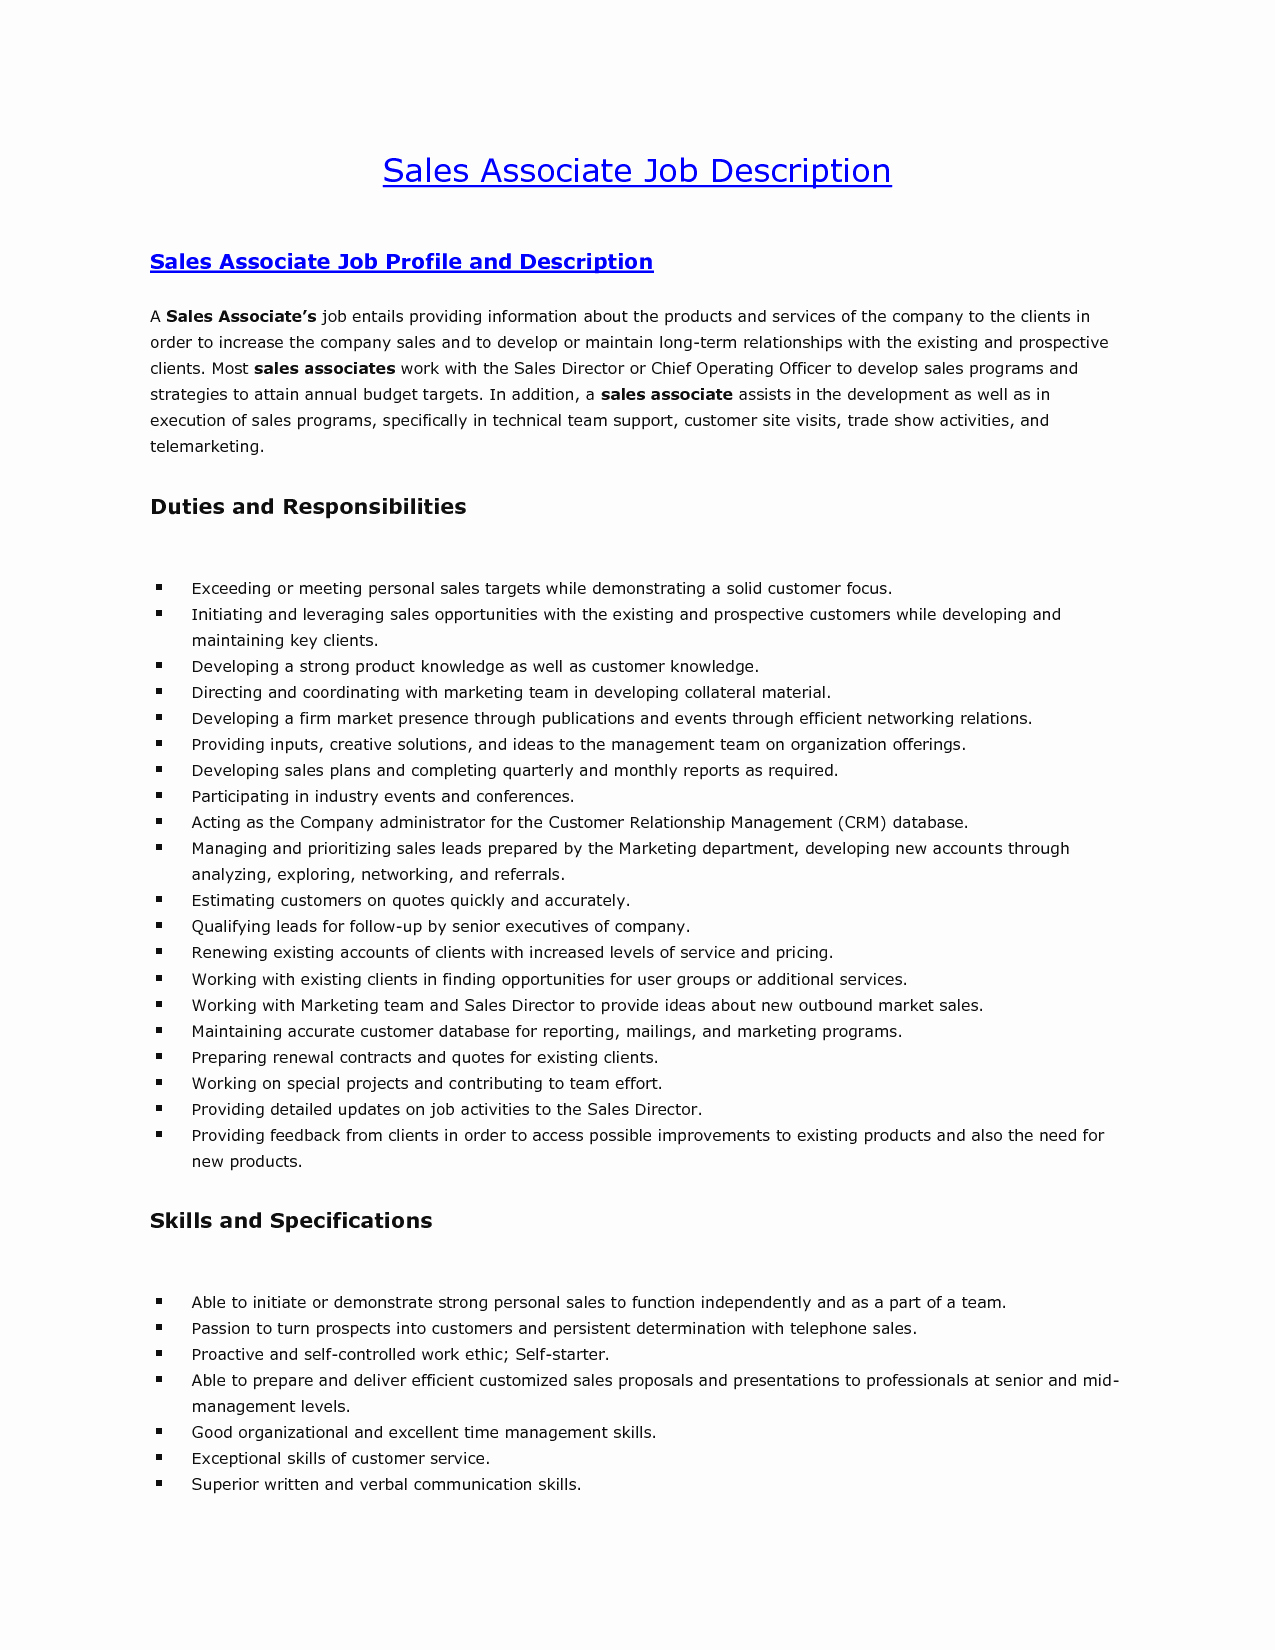 Sales associate Job Descriptions for Resume